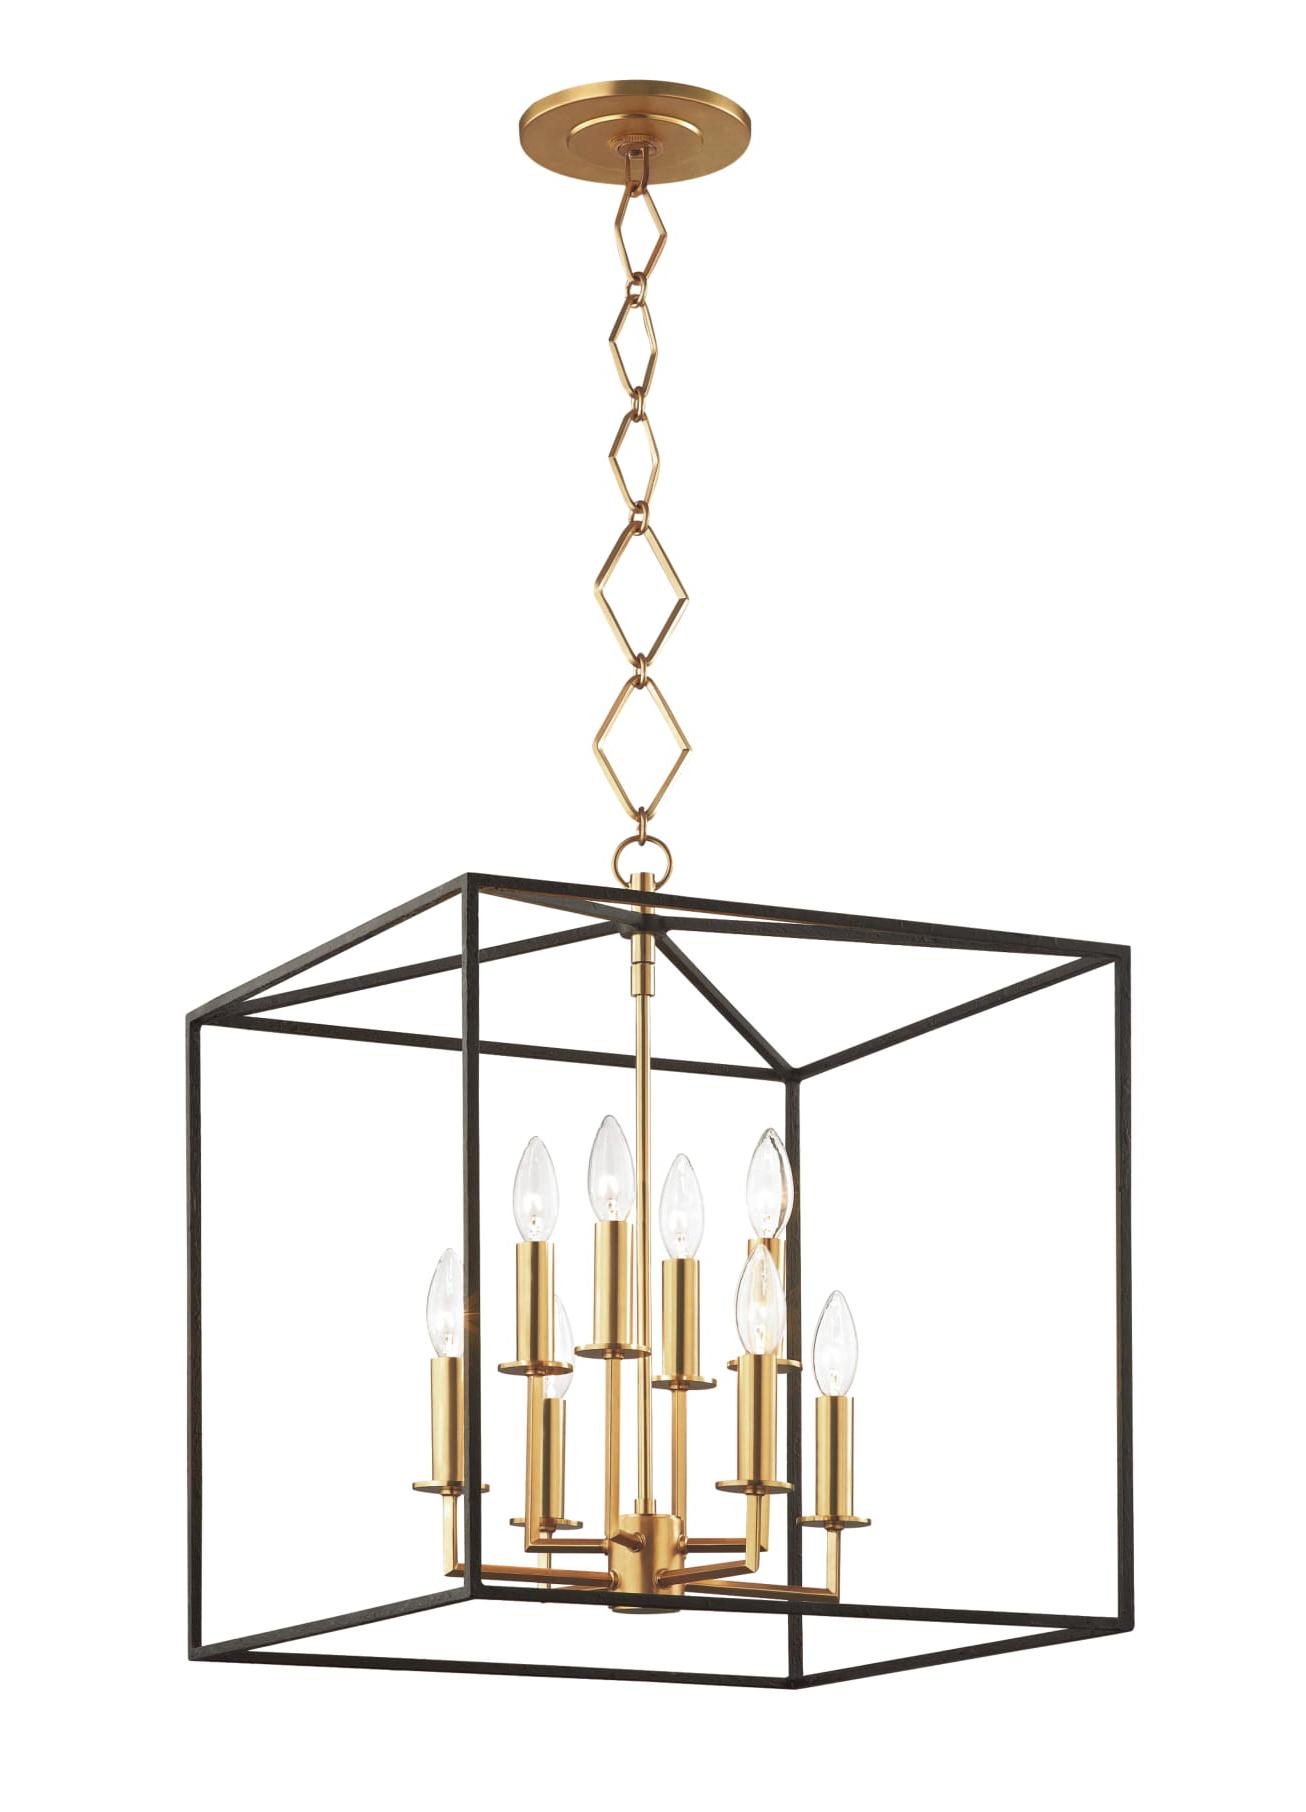 Destrey 3-Light Lantern Square/rectangle Pendants inside 2020 Richie 8 Light Pendant - Agb/bk - Industrial Pendants